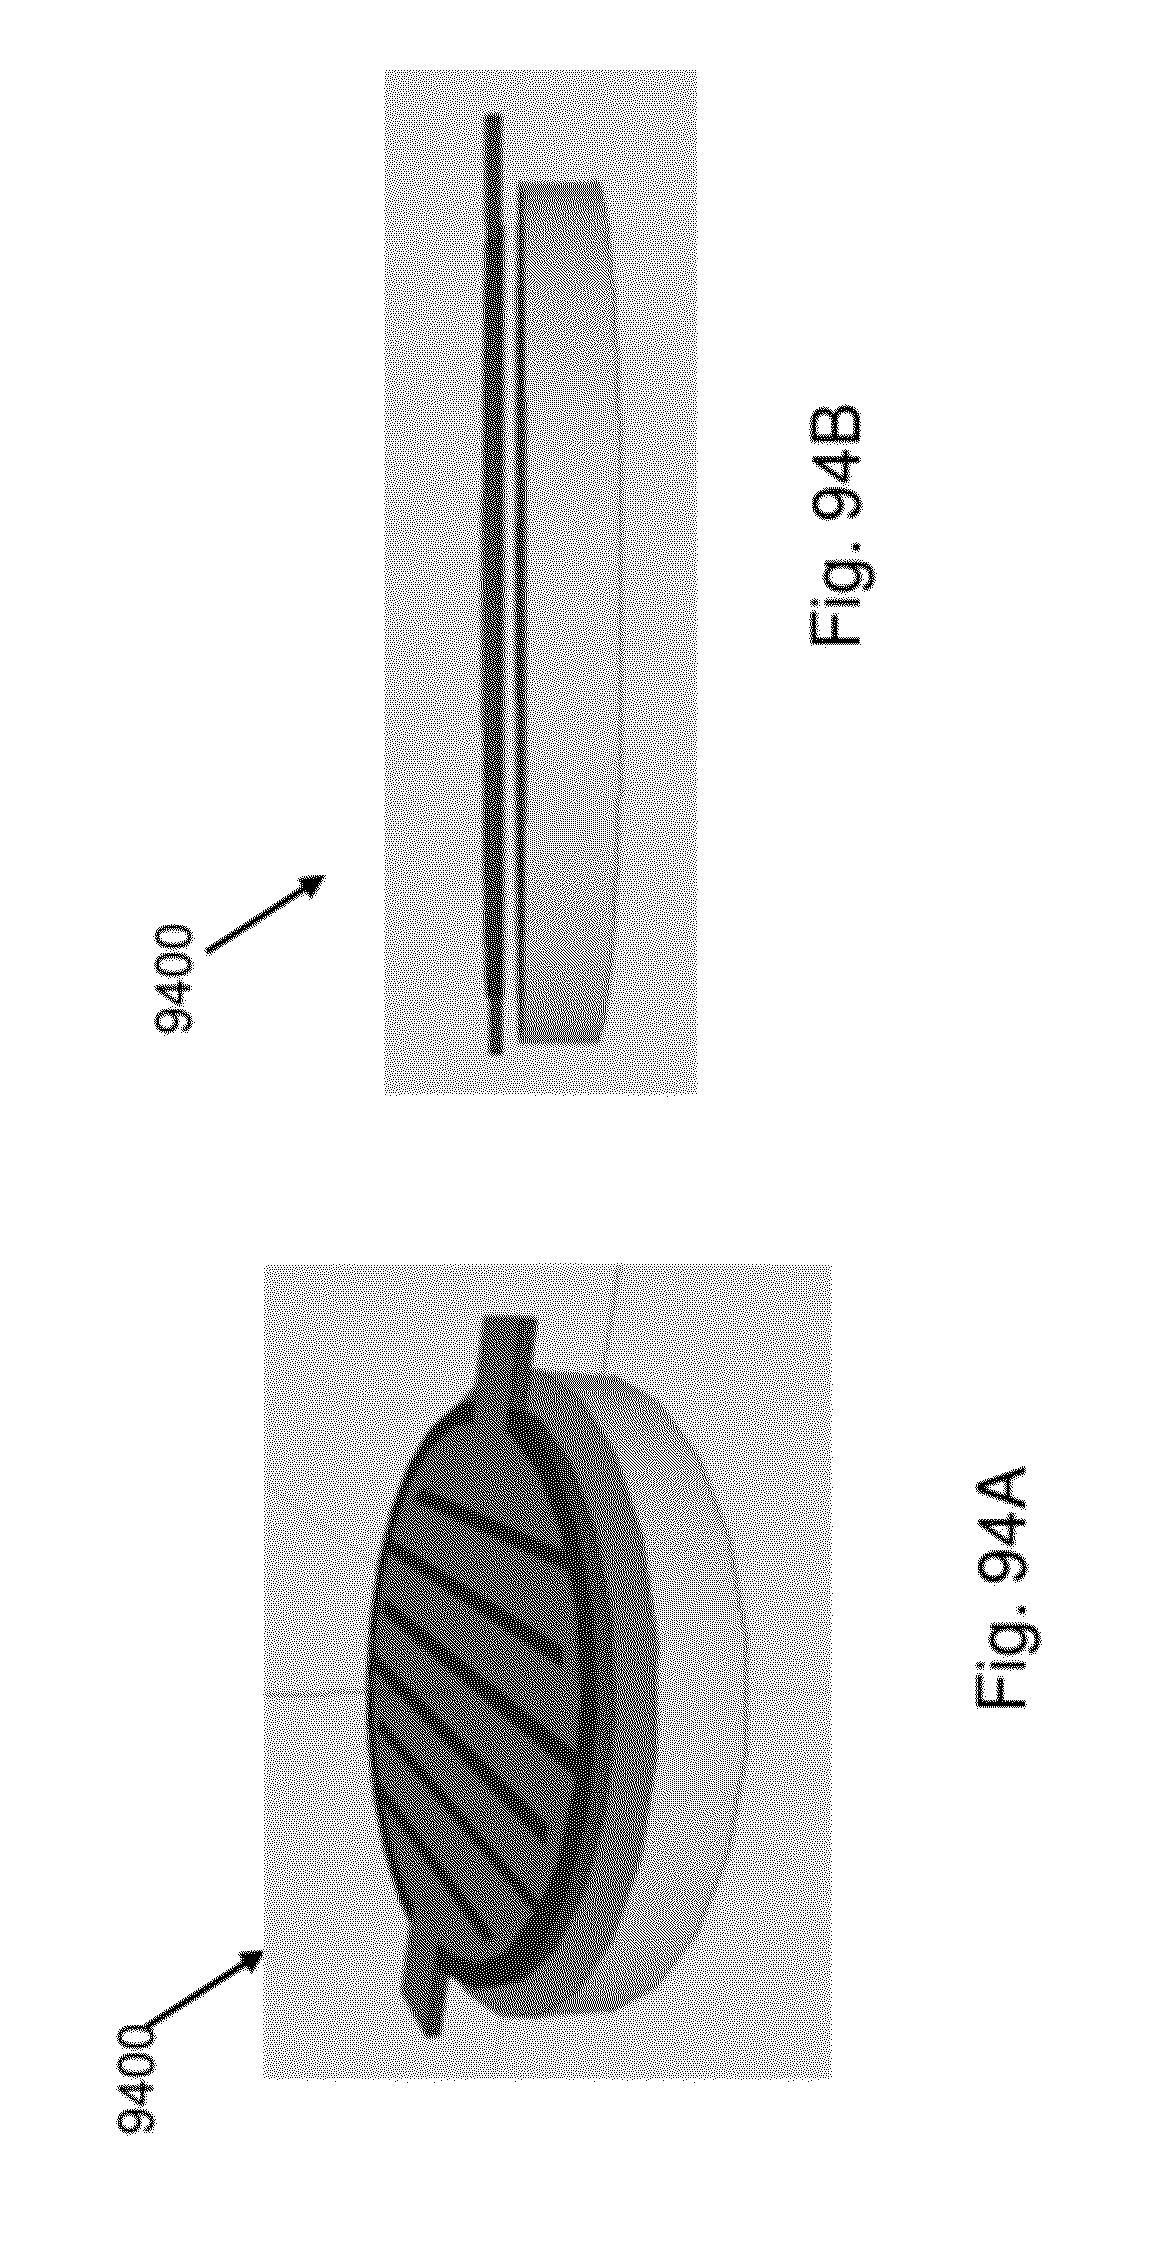 Patent US 8,472,120 B2